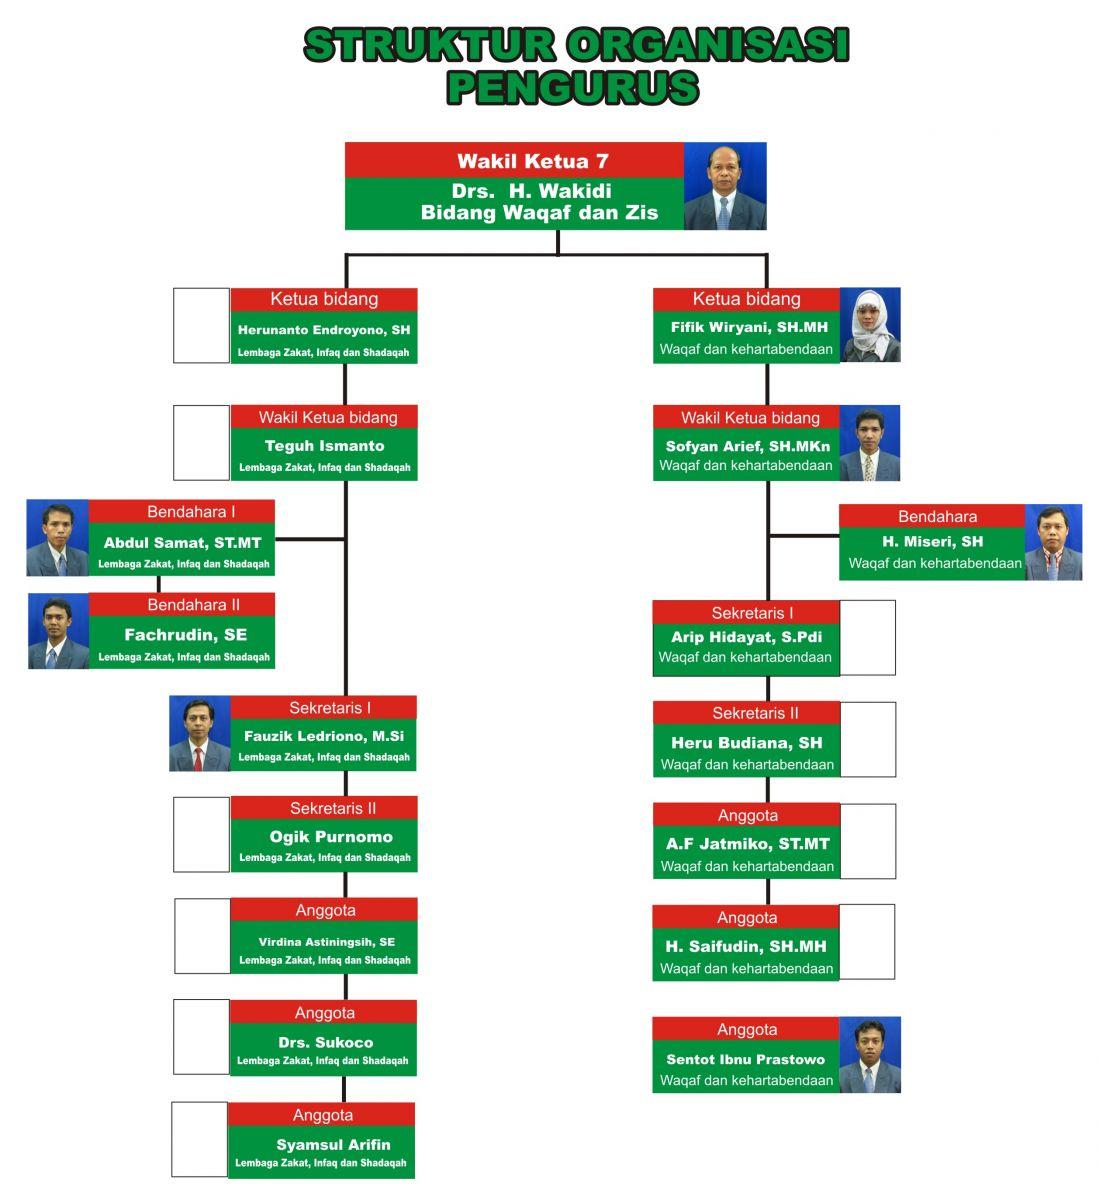 Waqaf dan kehartabendaan - PDM Kabupaten Malang | Muhammadiyah